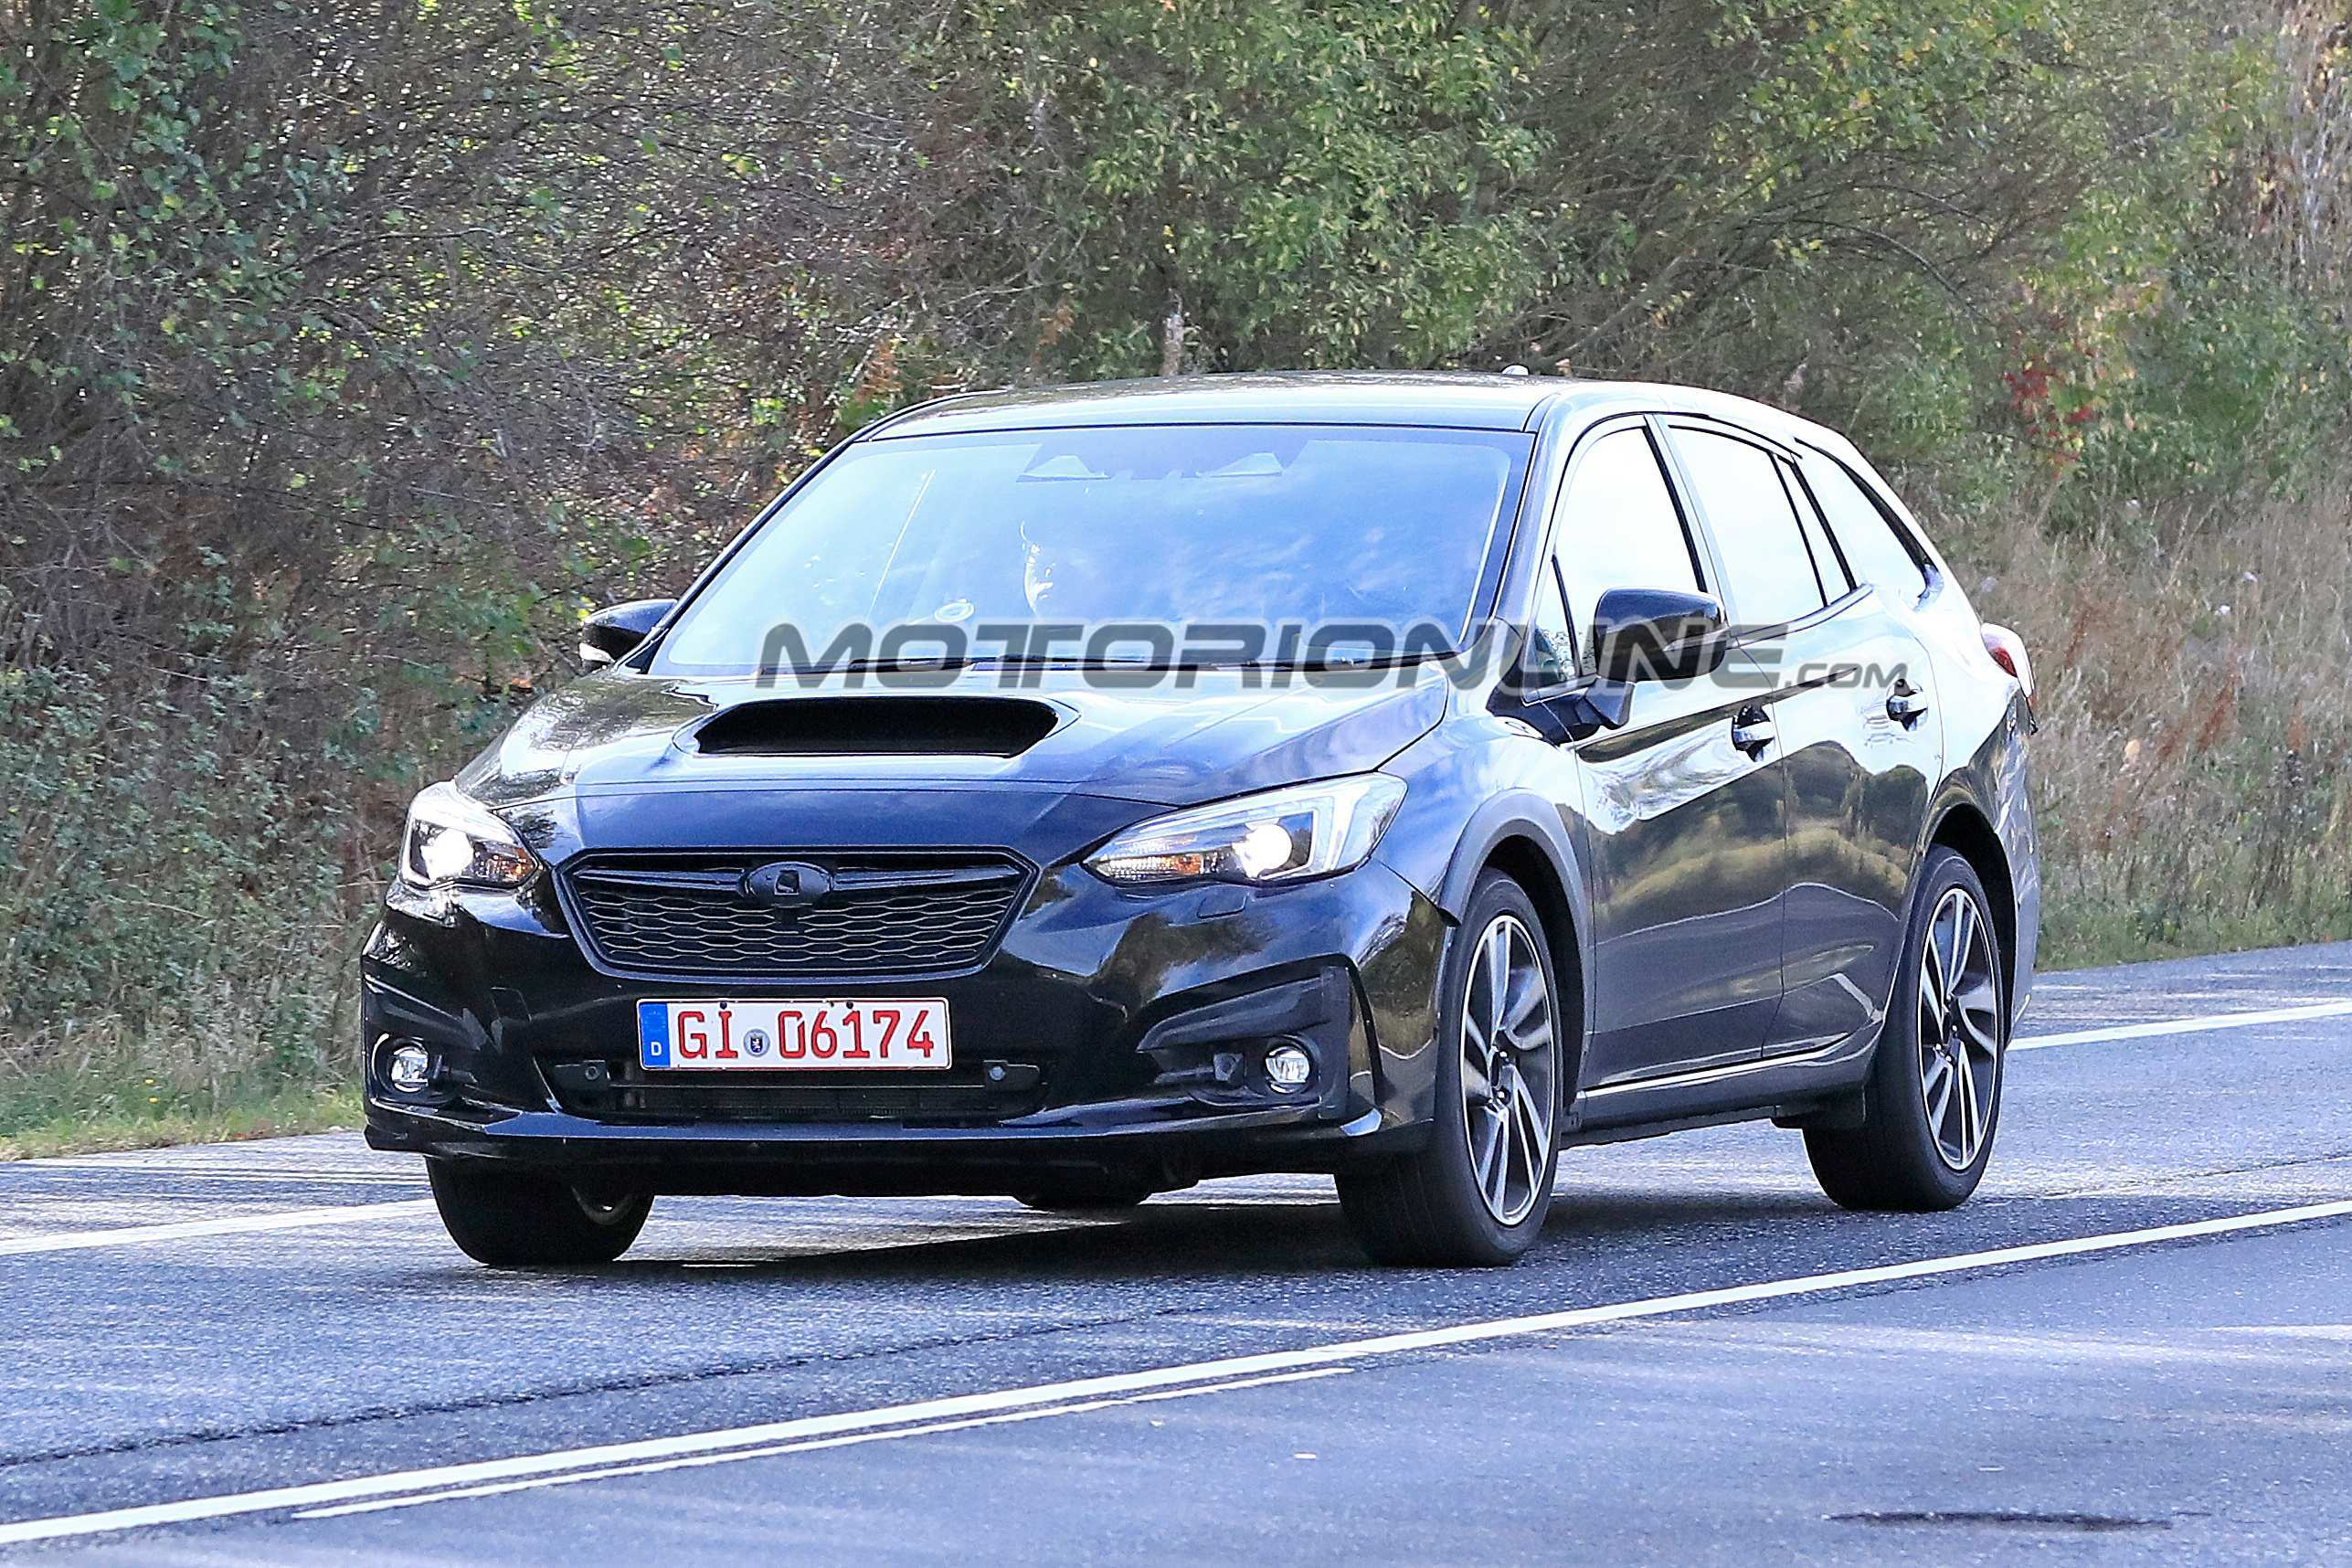 13 All New Subaru My 2020 Performance and New Engine with Subaru My 2020